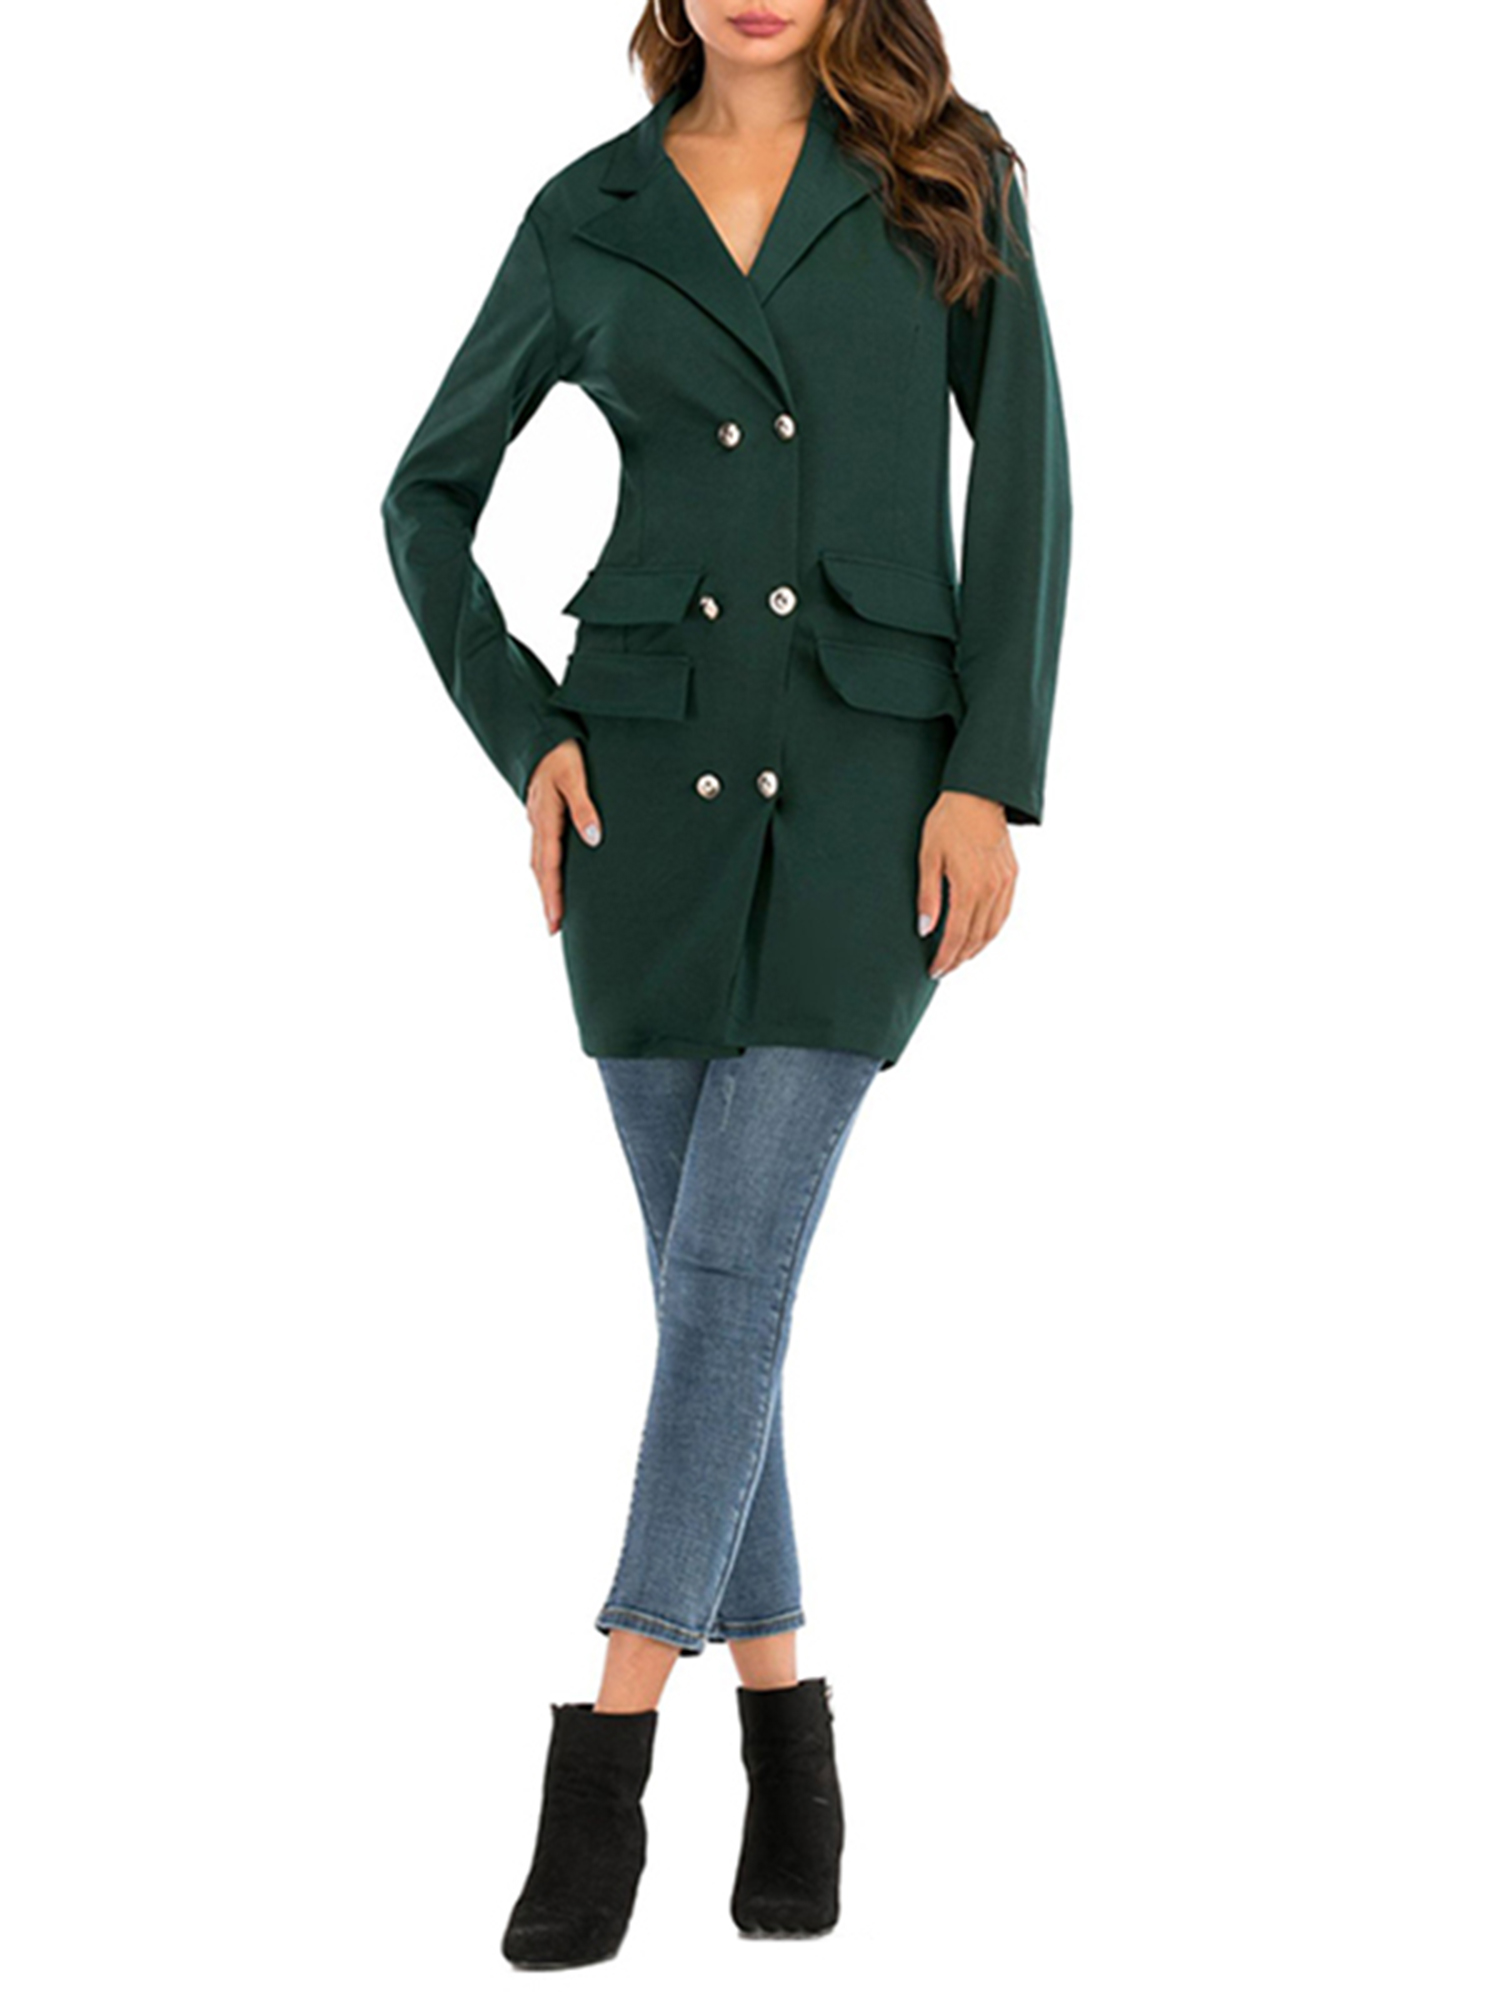 Vintage-Women-Double-Breasted-Plaid-Long-Blazer-Ladies-Jackets-Suits-Coat-Pocket miniatura 28